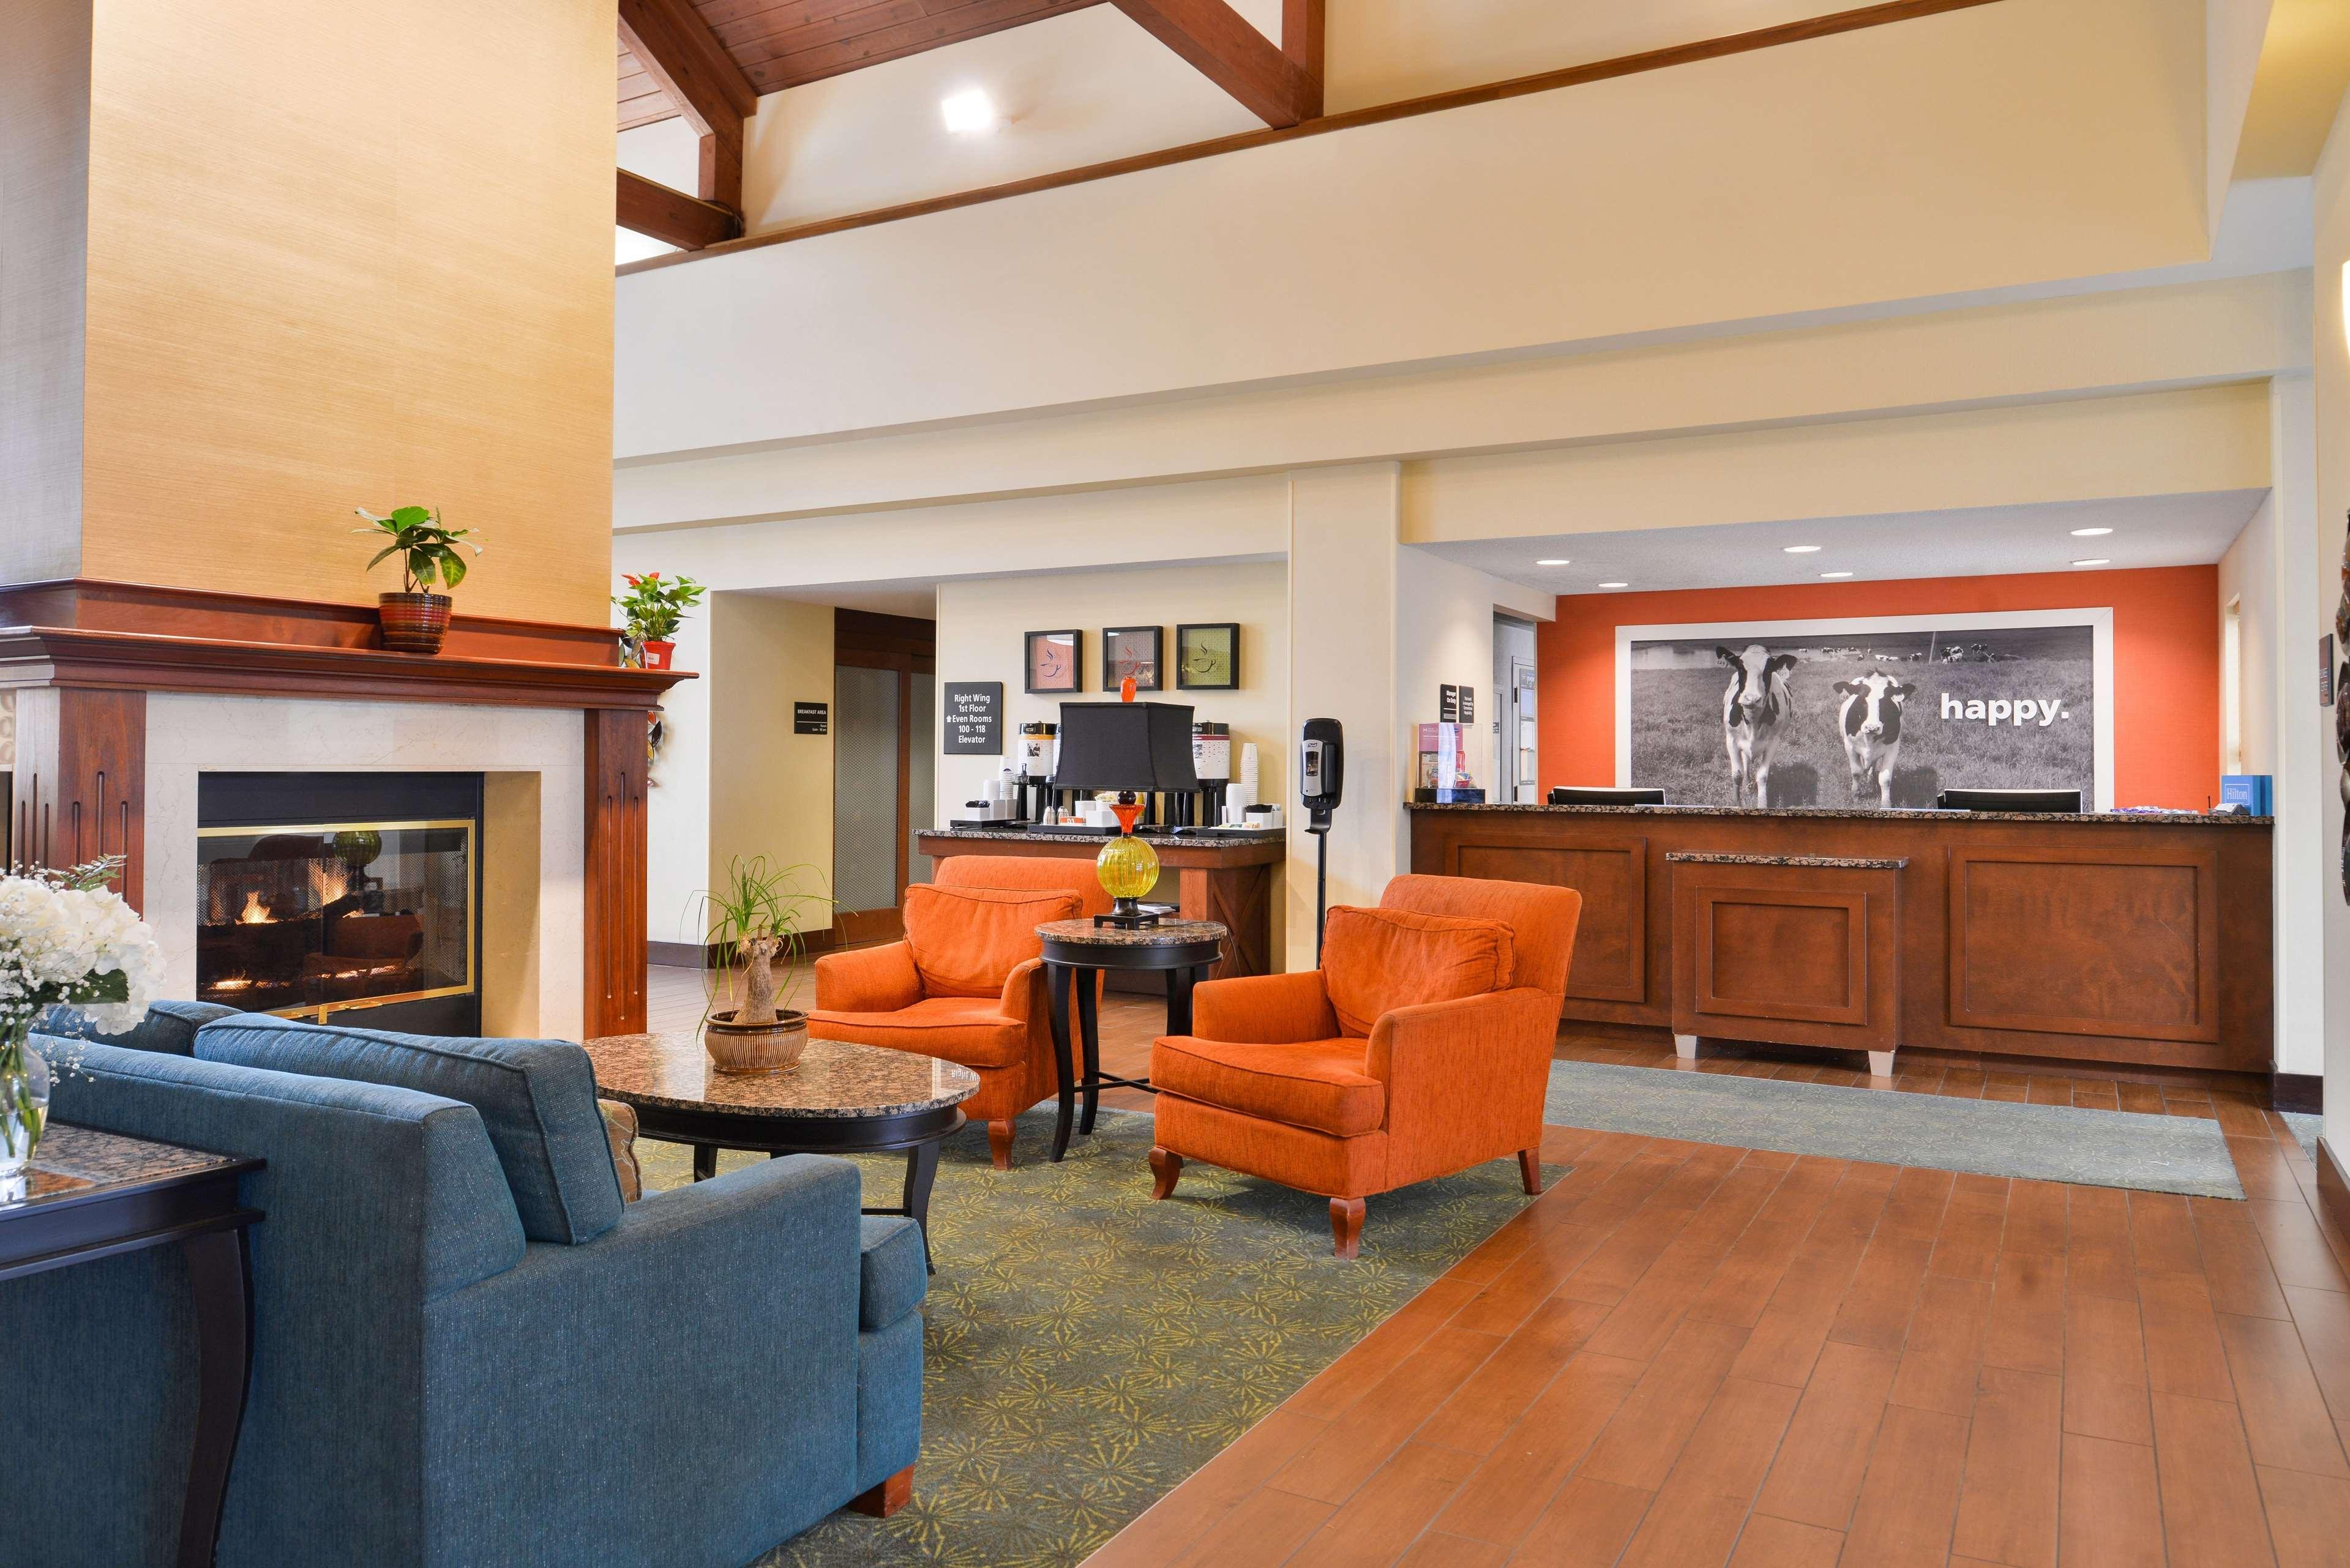 Hampton Inn & Suites Newport News (Oyster Point) image 4